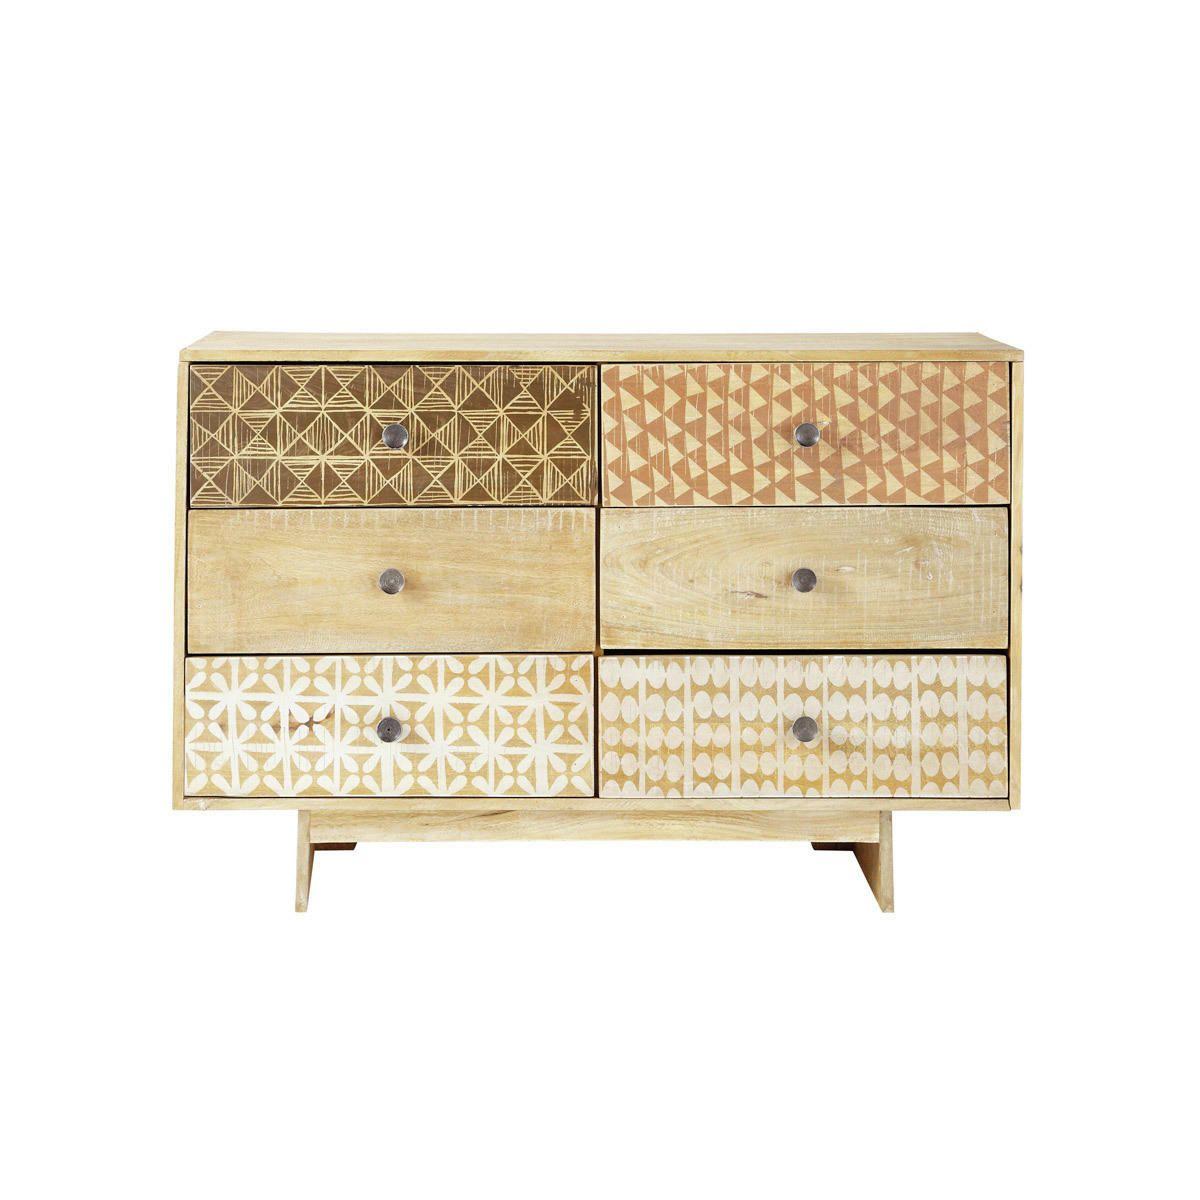 6-drawer dresser with designs - Serengeti Serengeti